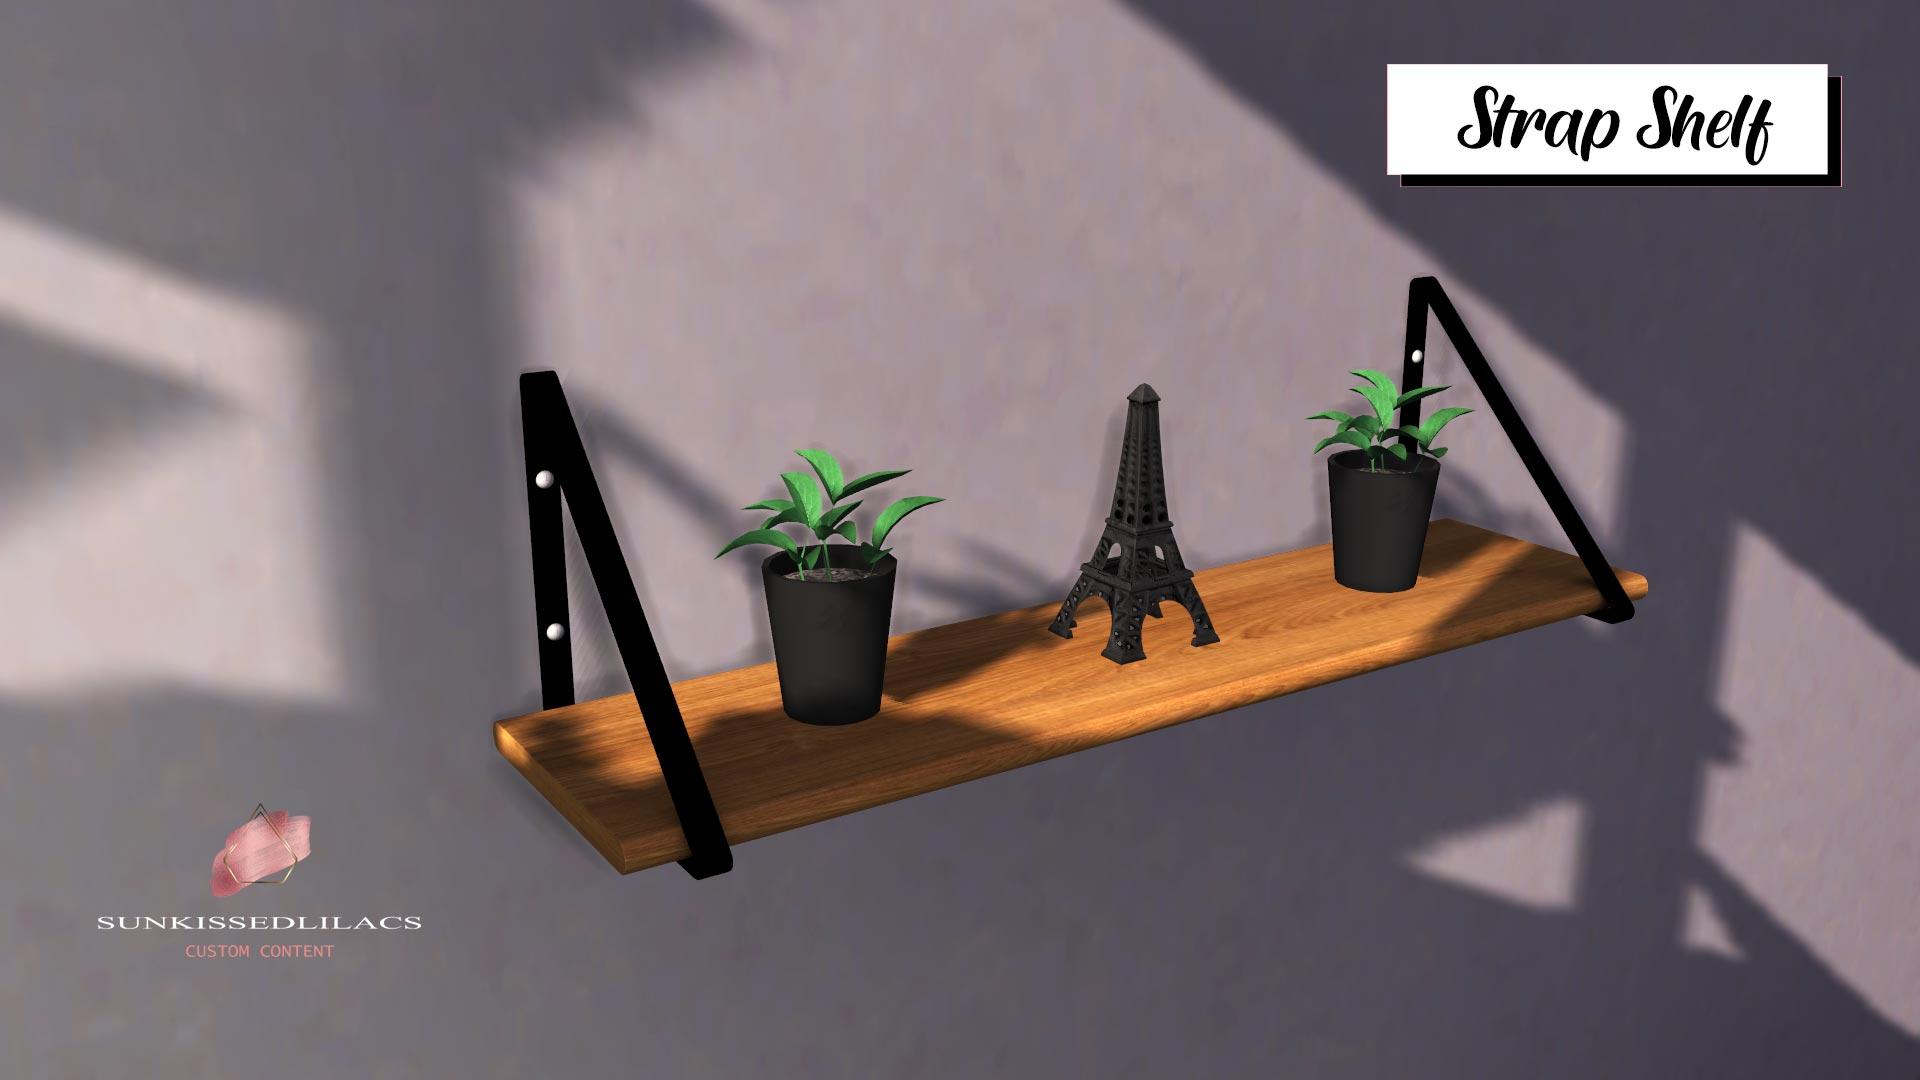 Strap Shelf, high quality sims 4 cc, sunkissedlilacs, free sims 4 decor, sims 4 custom content,